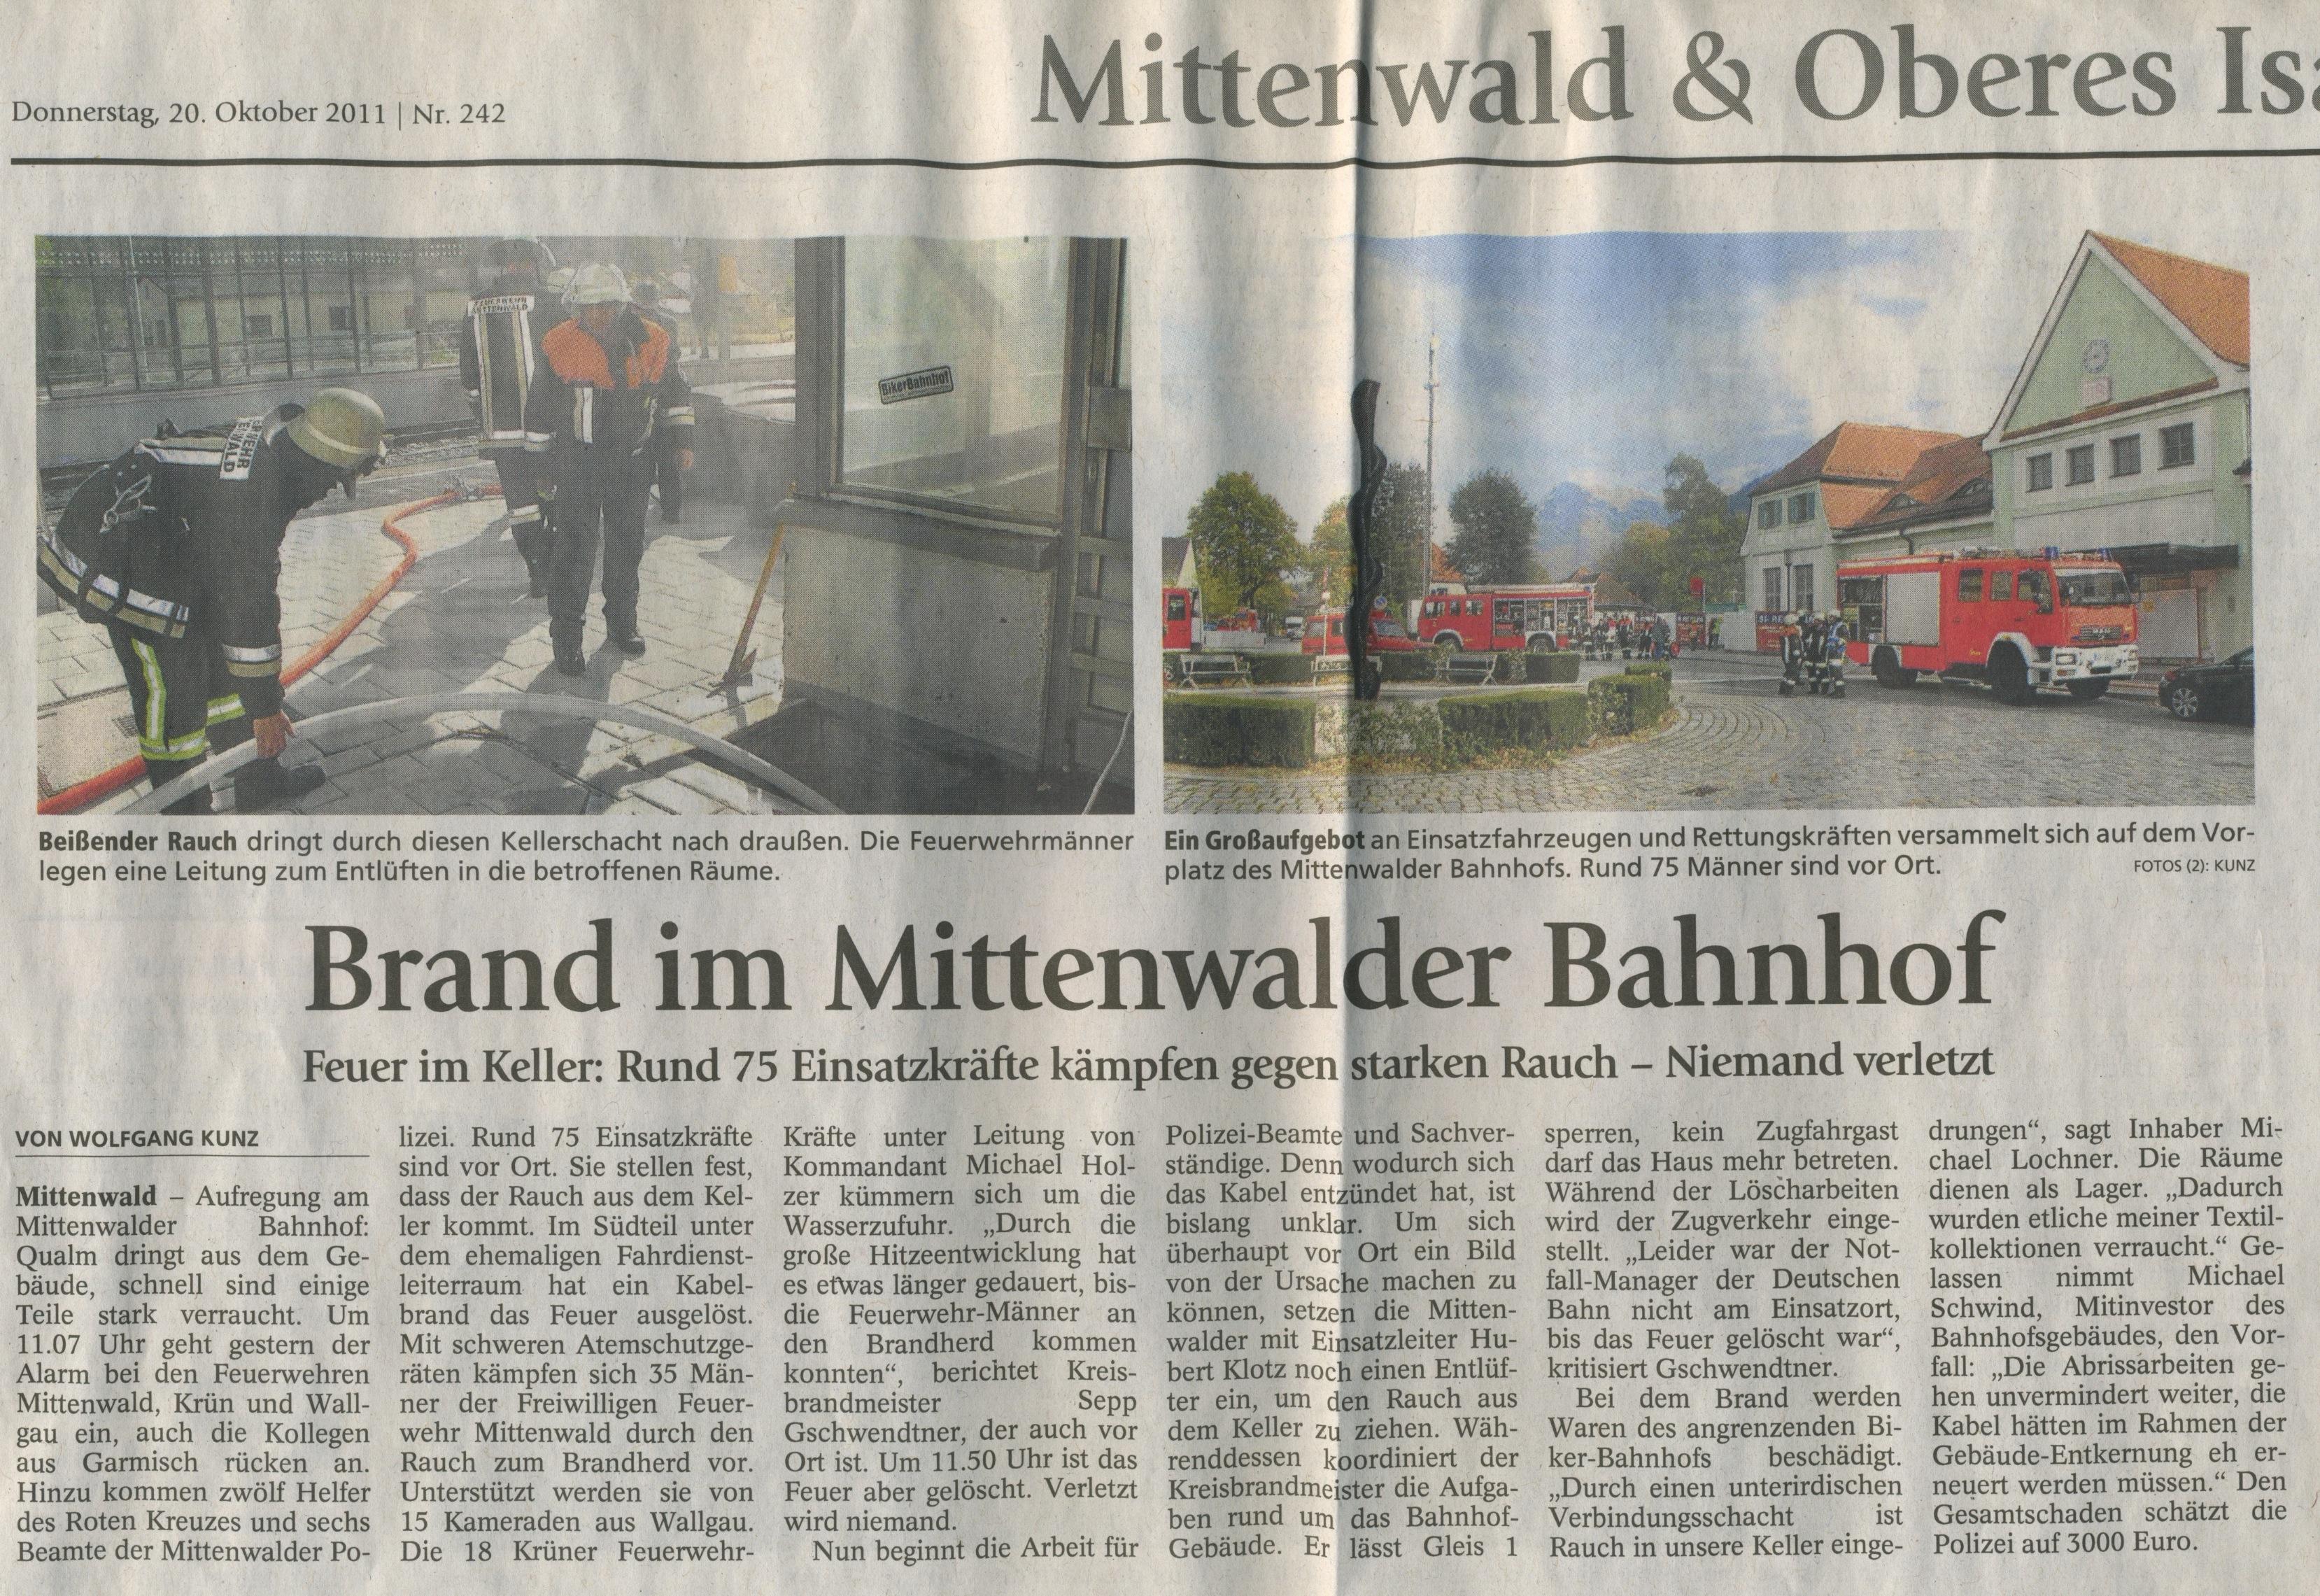 Garmisch-Partenkirchner Tagblatt 20oct2011